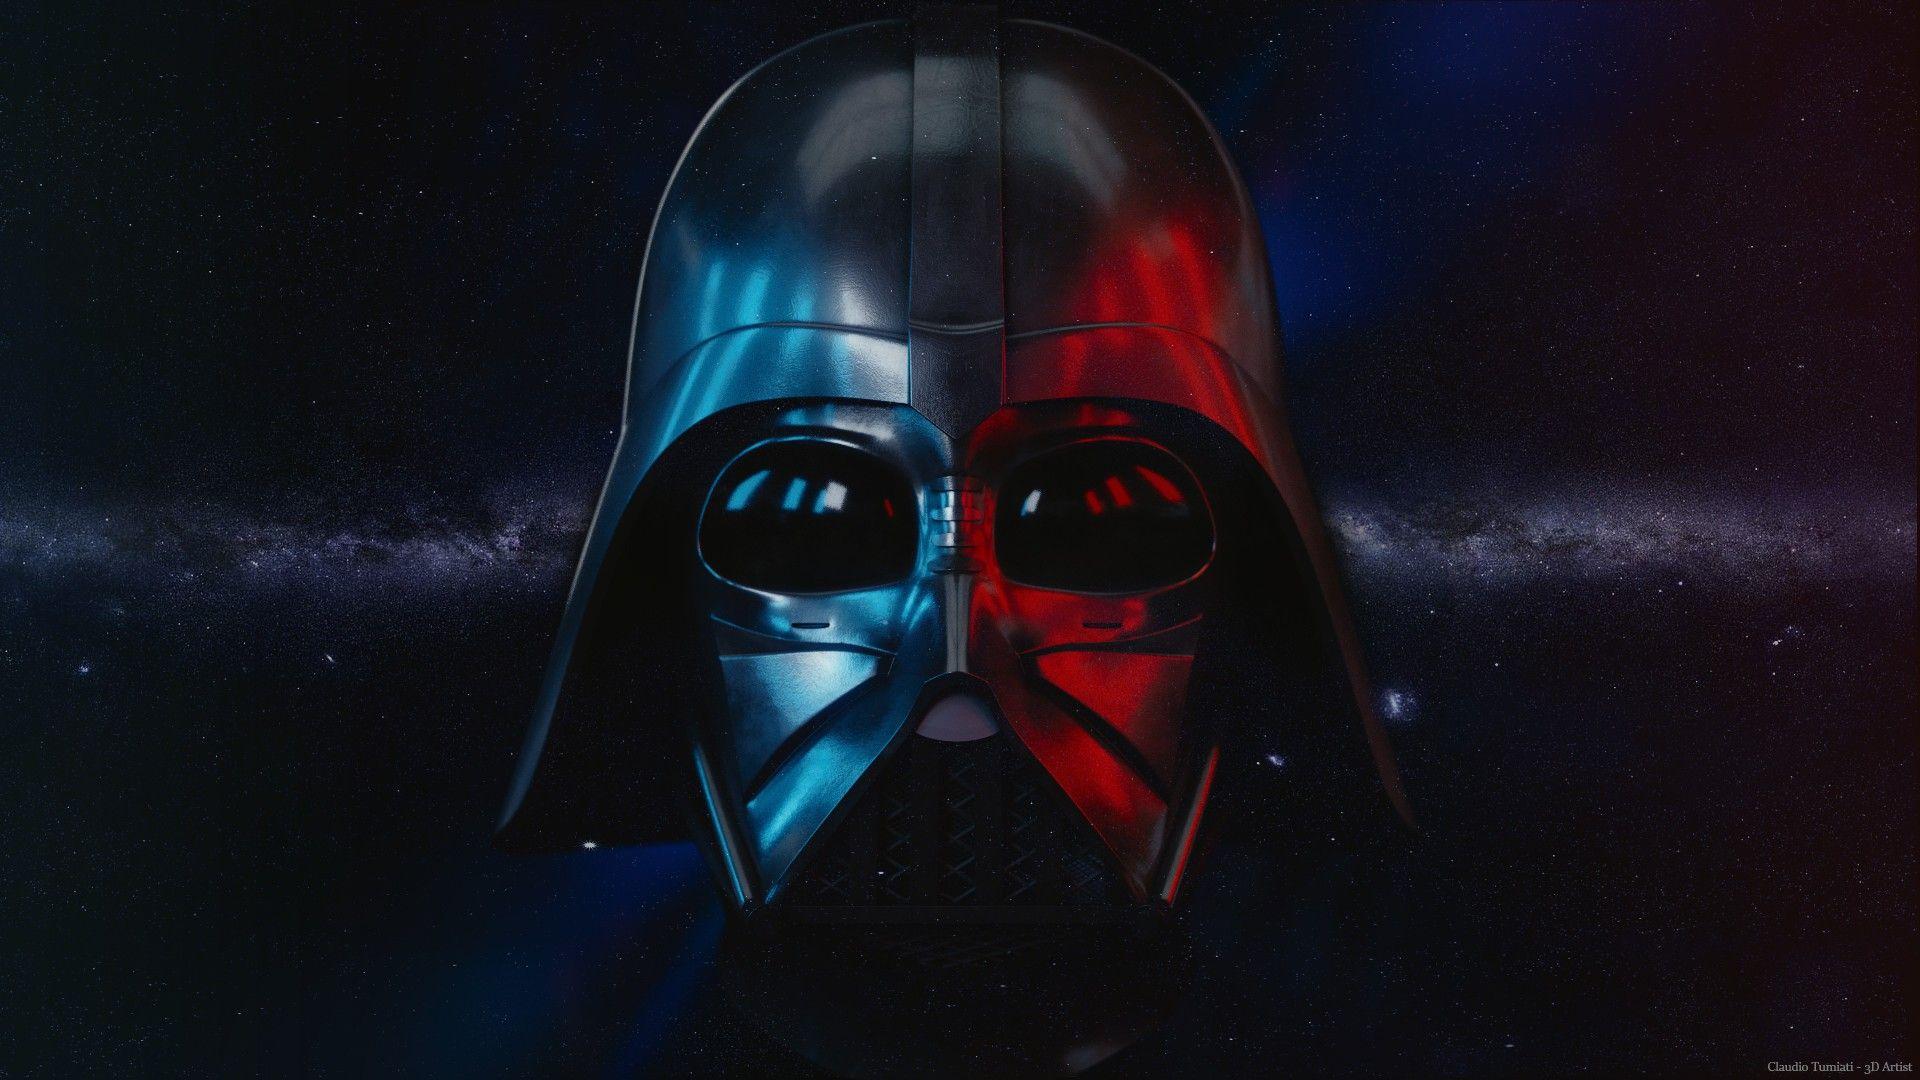 Anakin Skywalker Darth Vader Wallpaper